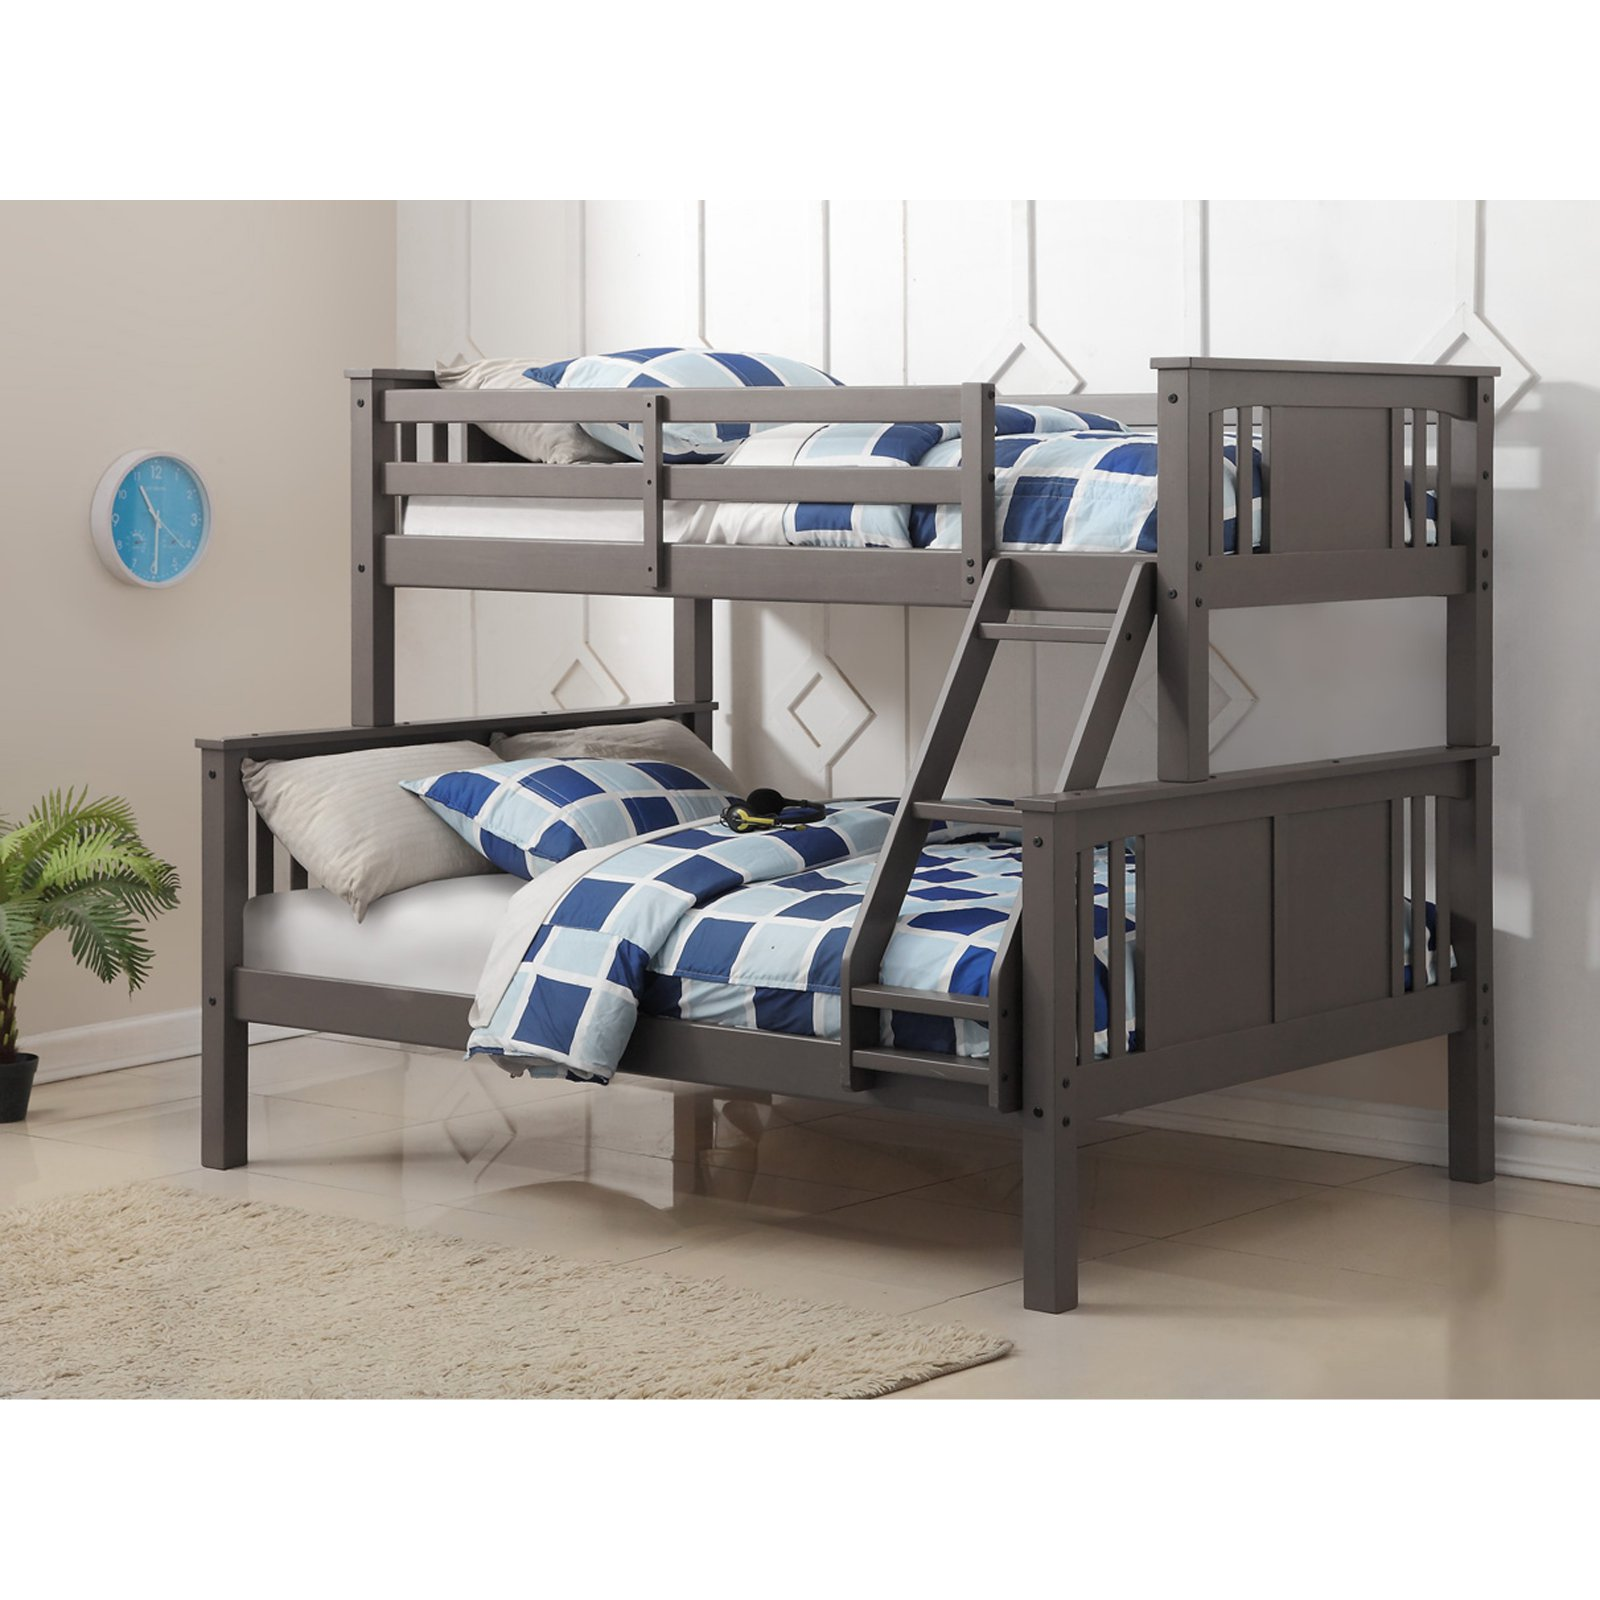 Donco Kids Twin/Full Princeton Bunk Bed